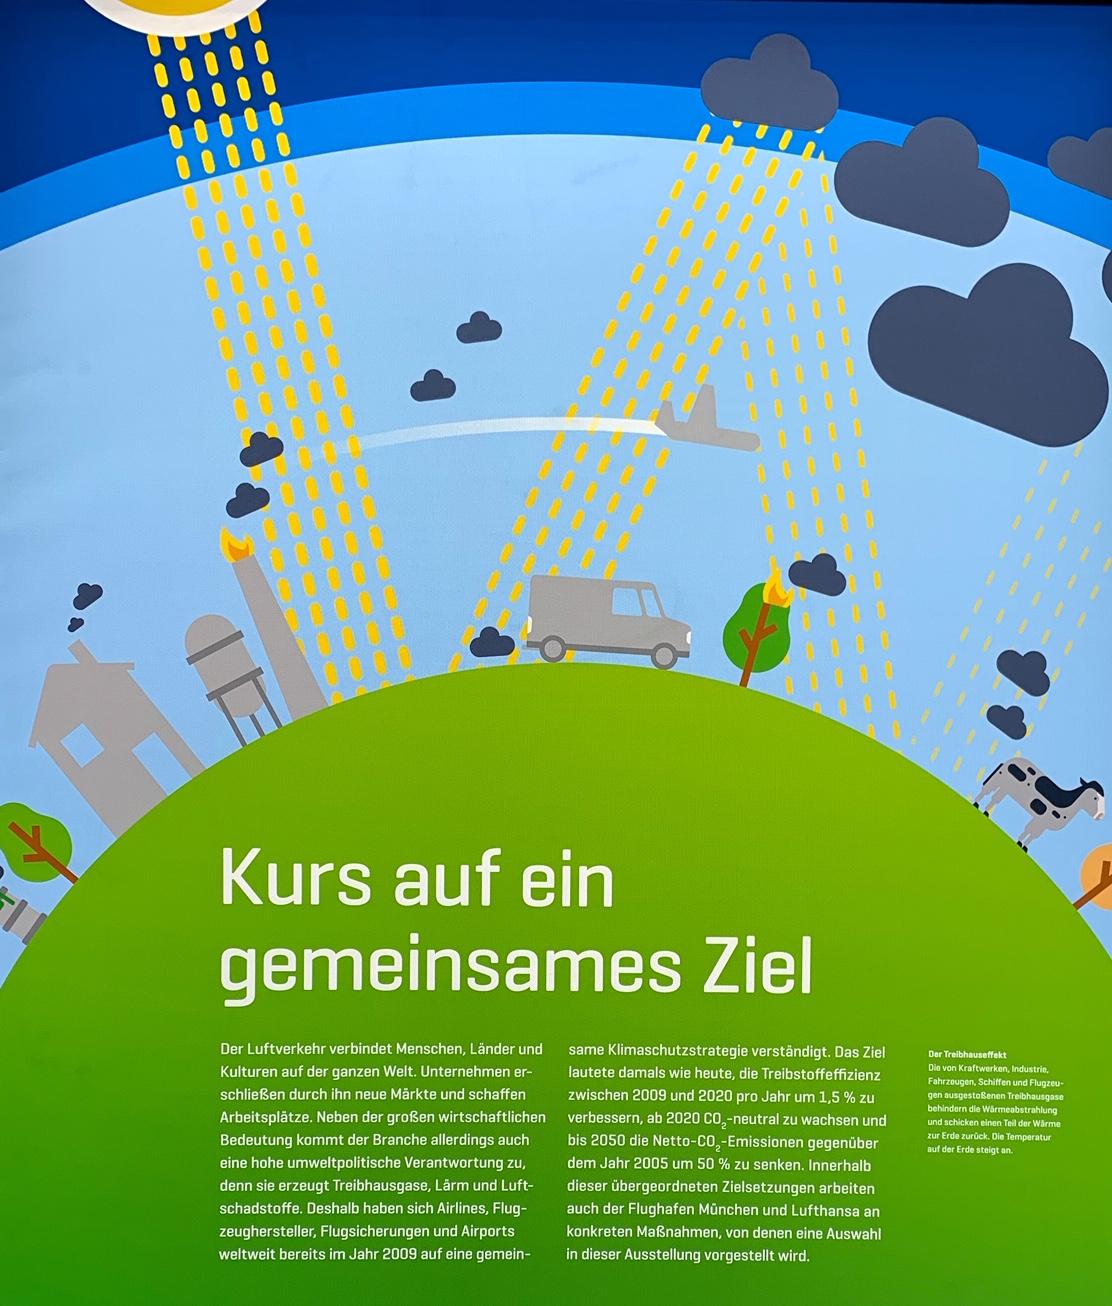 Umwelt Stiftunglife Bildung Umwelt Gesundheit Gesellschaft